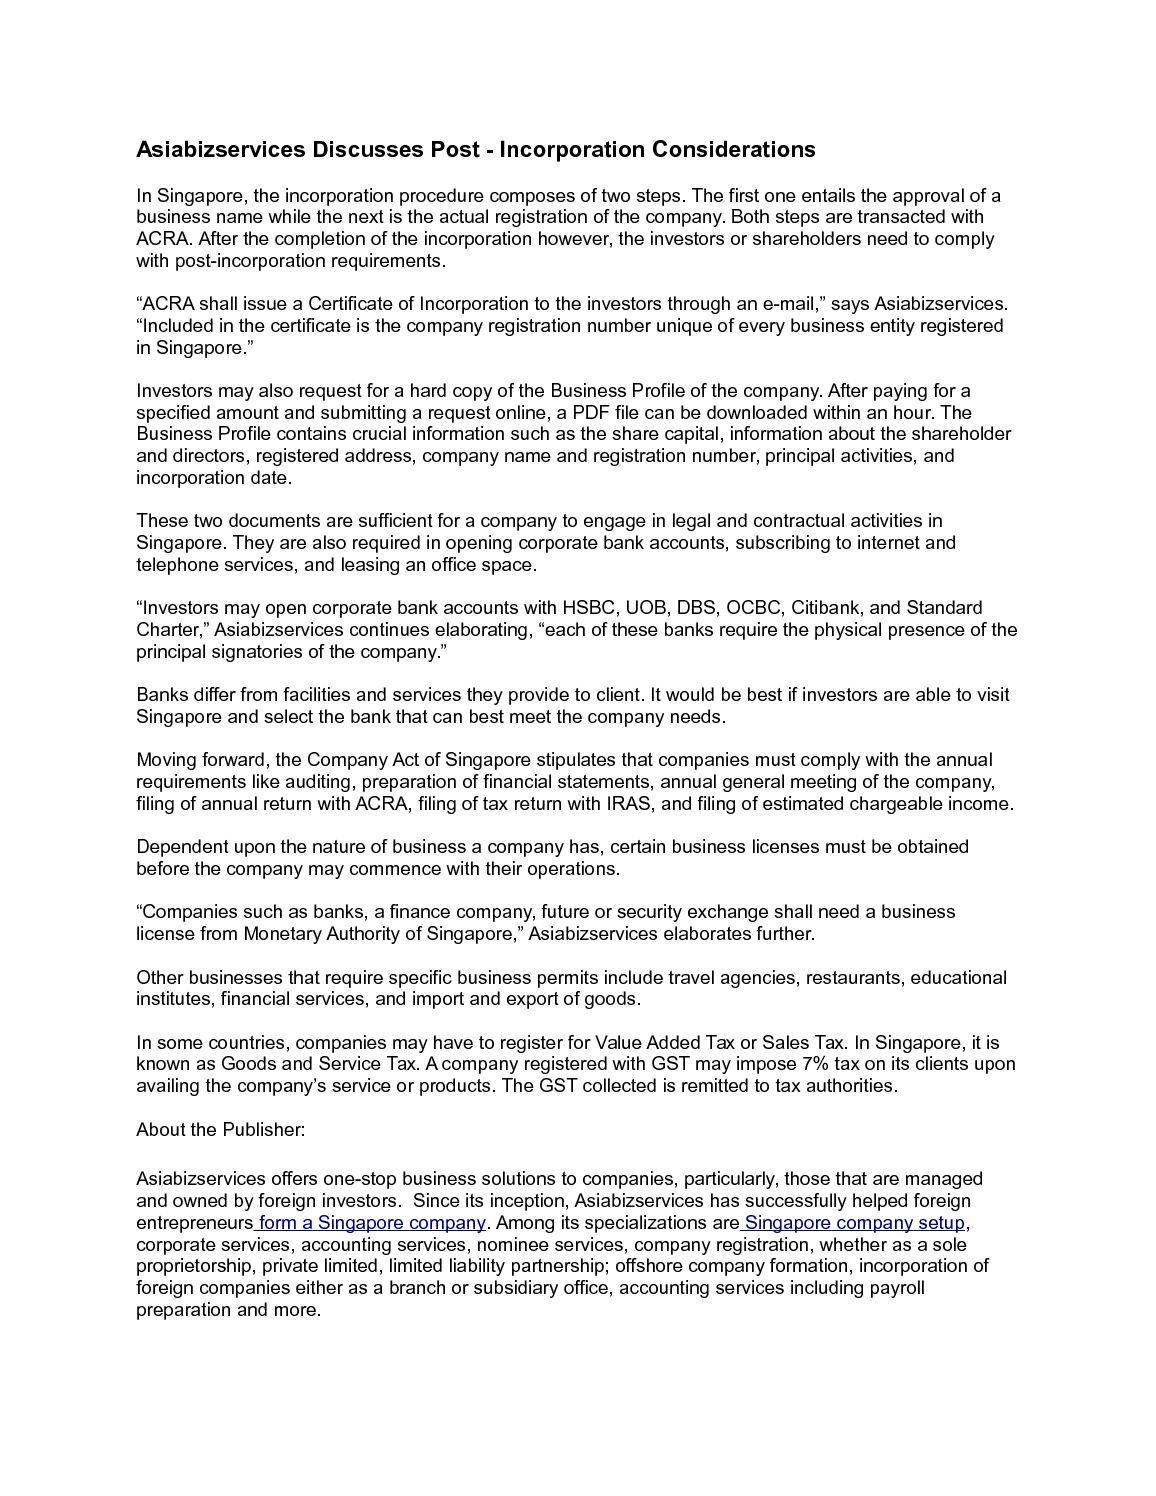 Calaméo - Asiabizservices Discusses Post - Incorporation